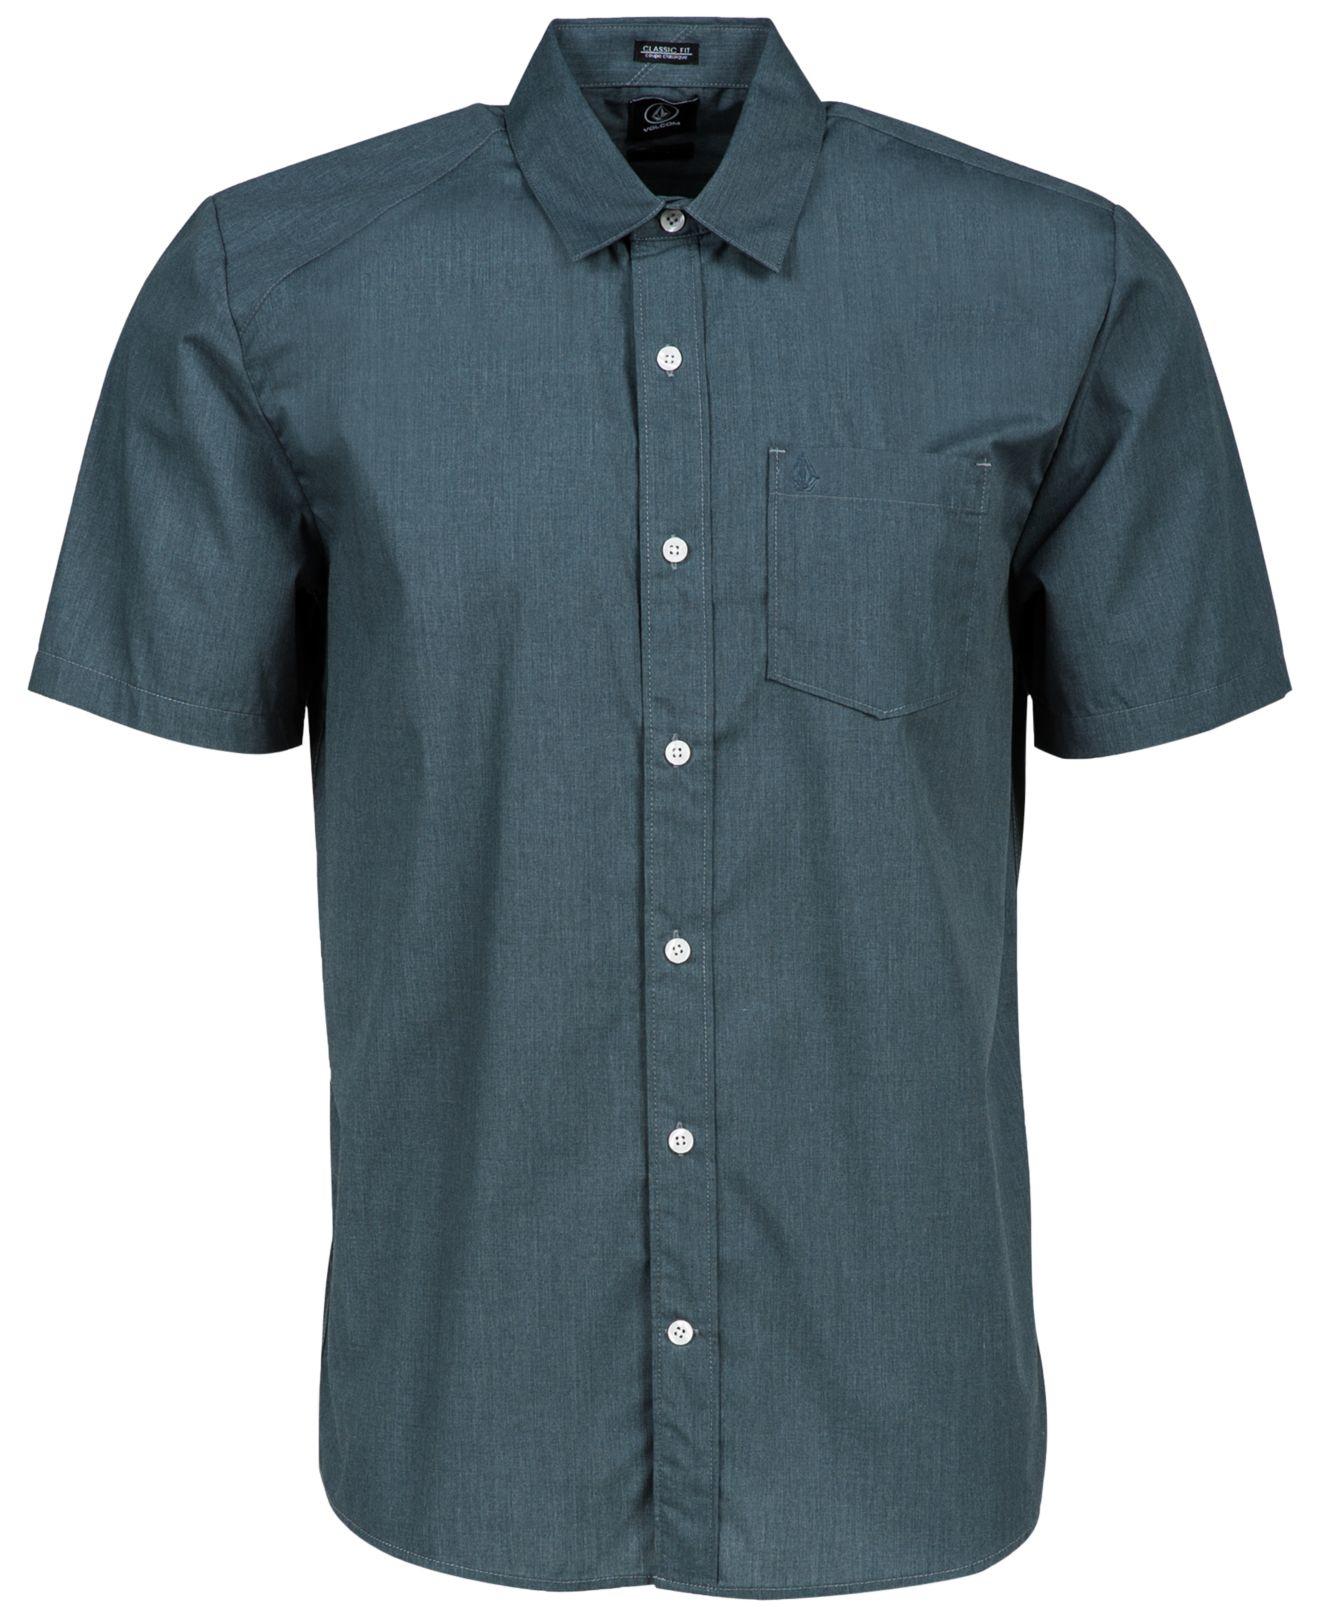 volcom men 39 s everett solid short sleeve shirt in gray for